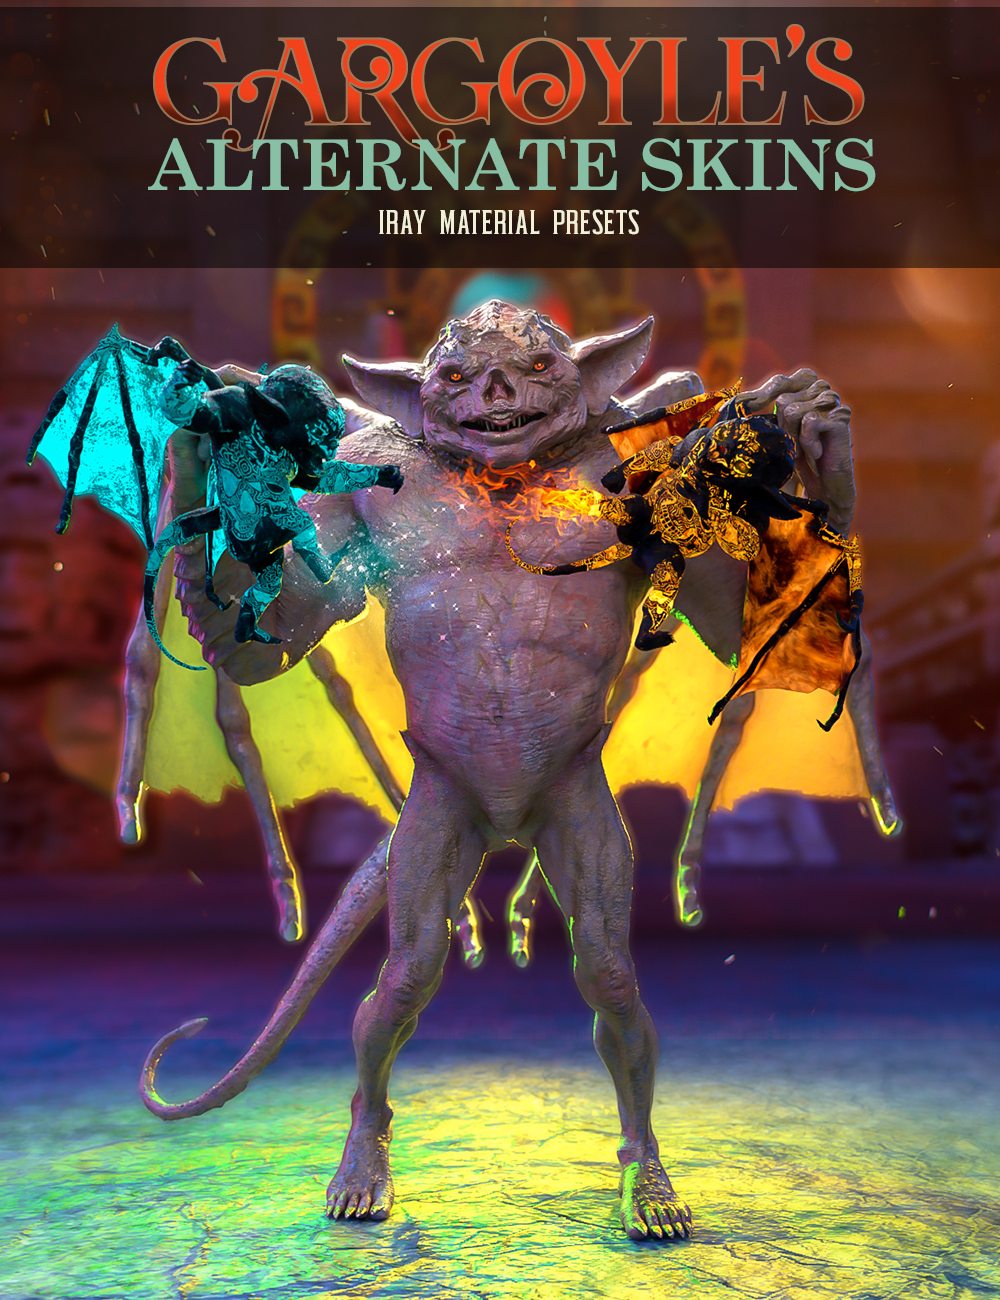 Gargoyle's Alternate Skins